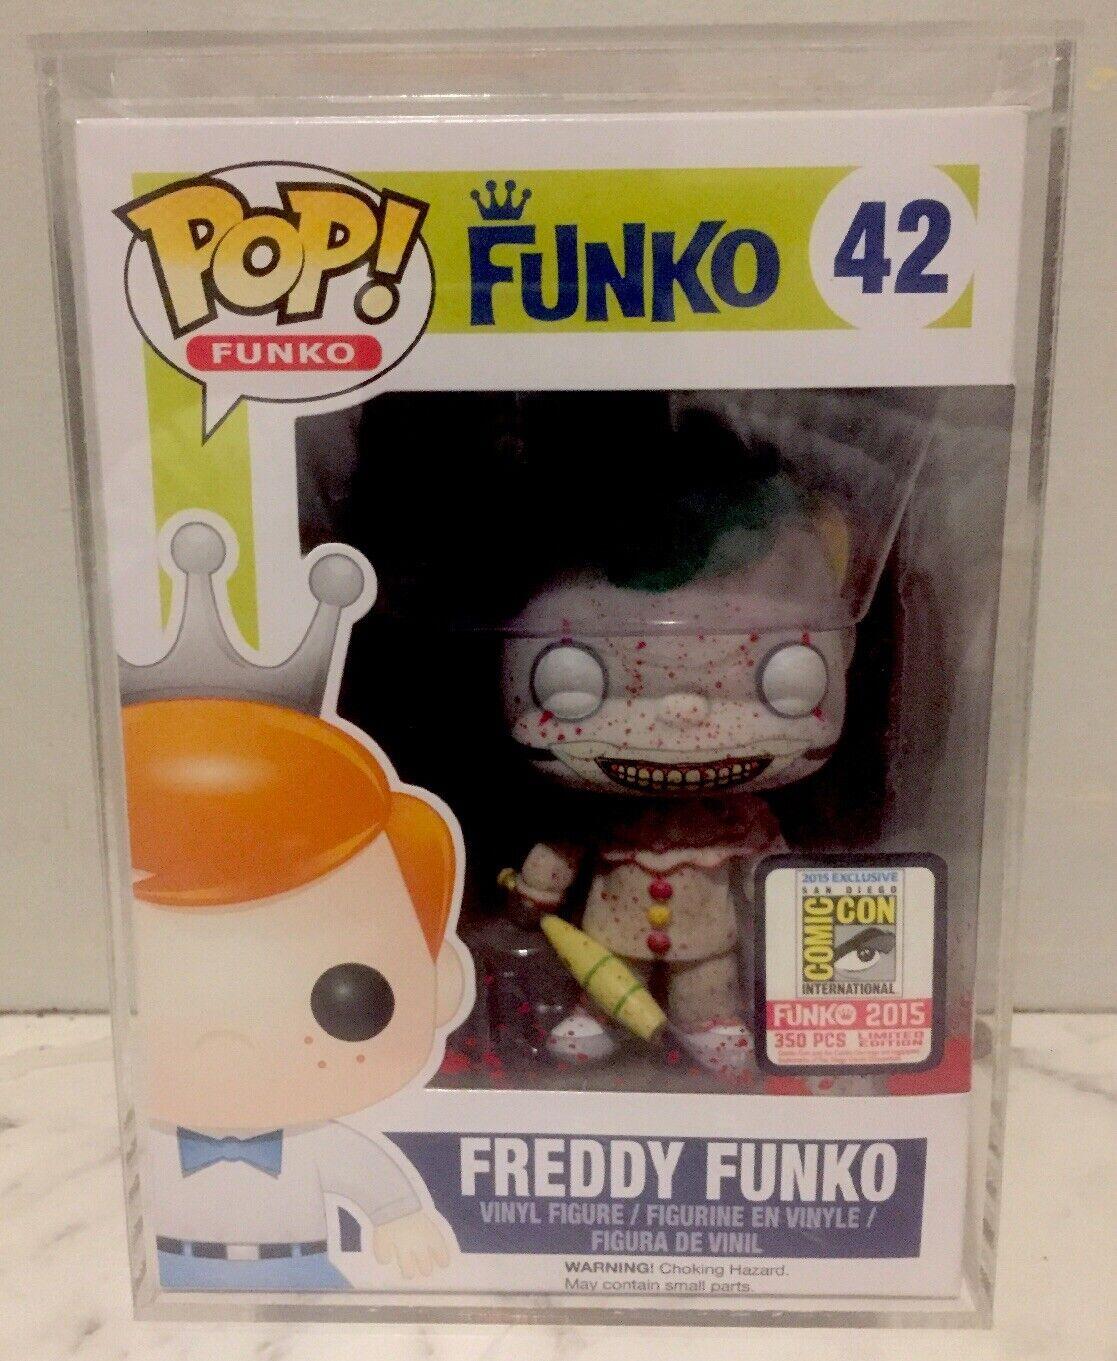 Funko Pop Freddy Funko Twisty American Horror Story SDCC EXC 1 350 (Bloody)